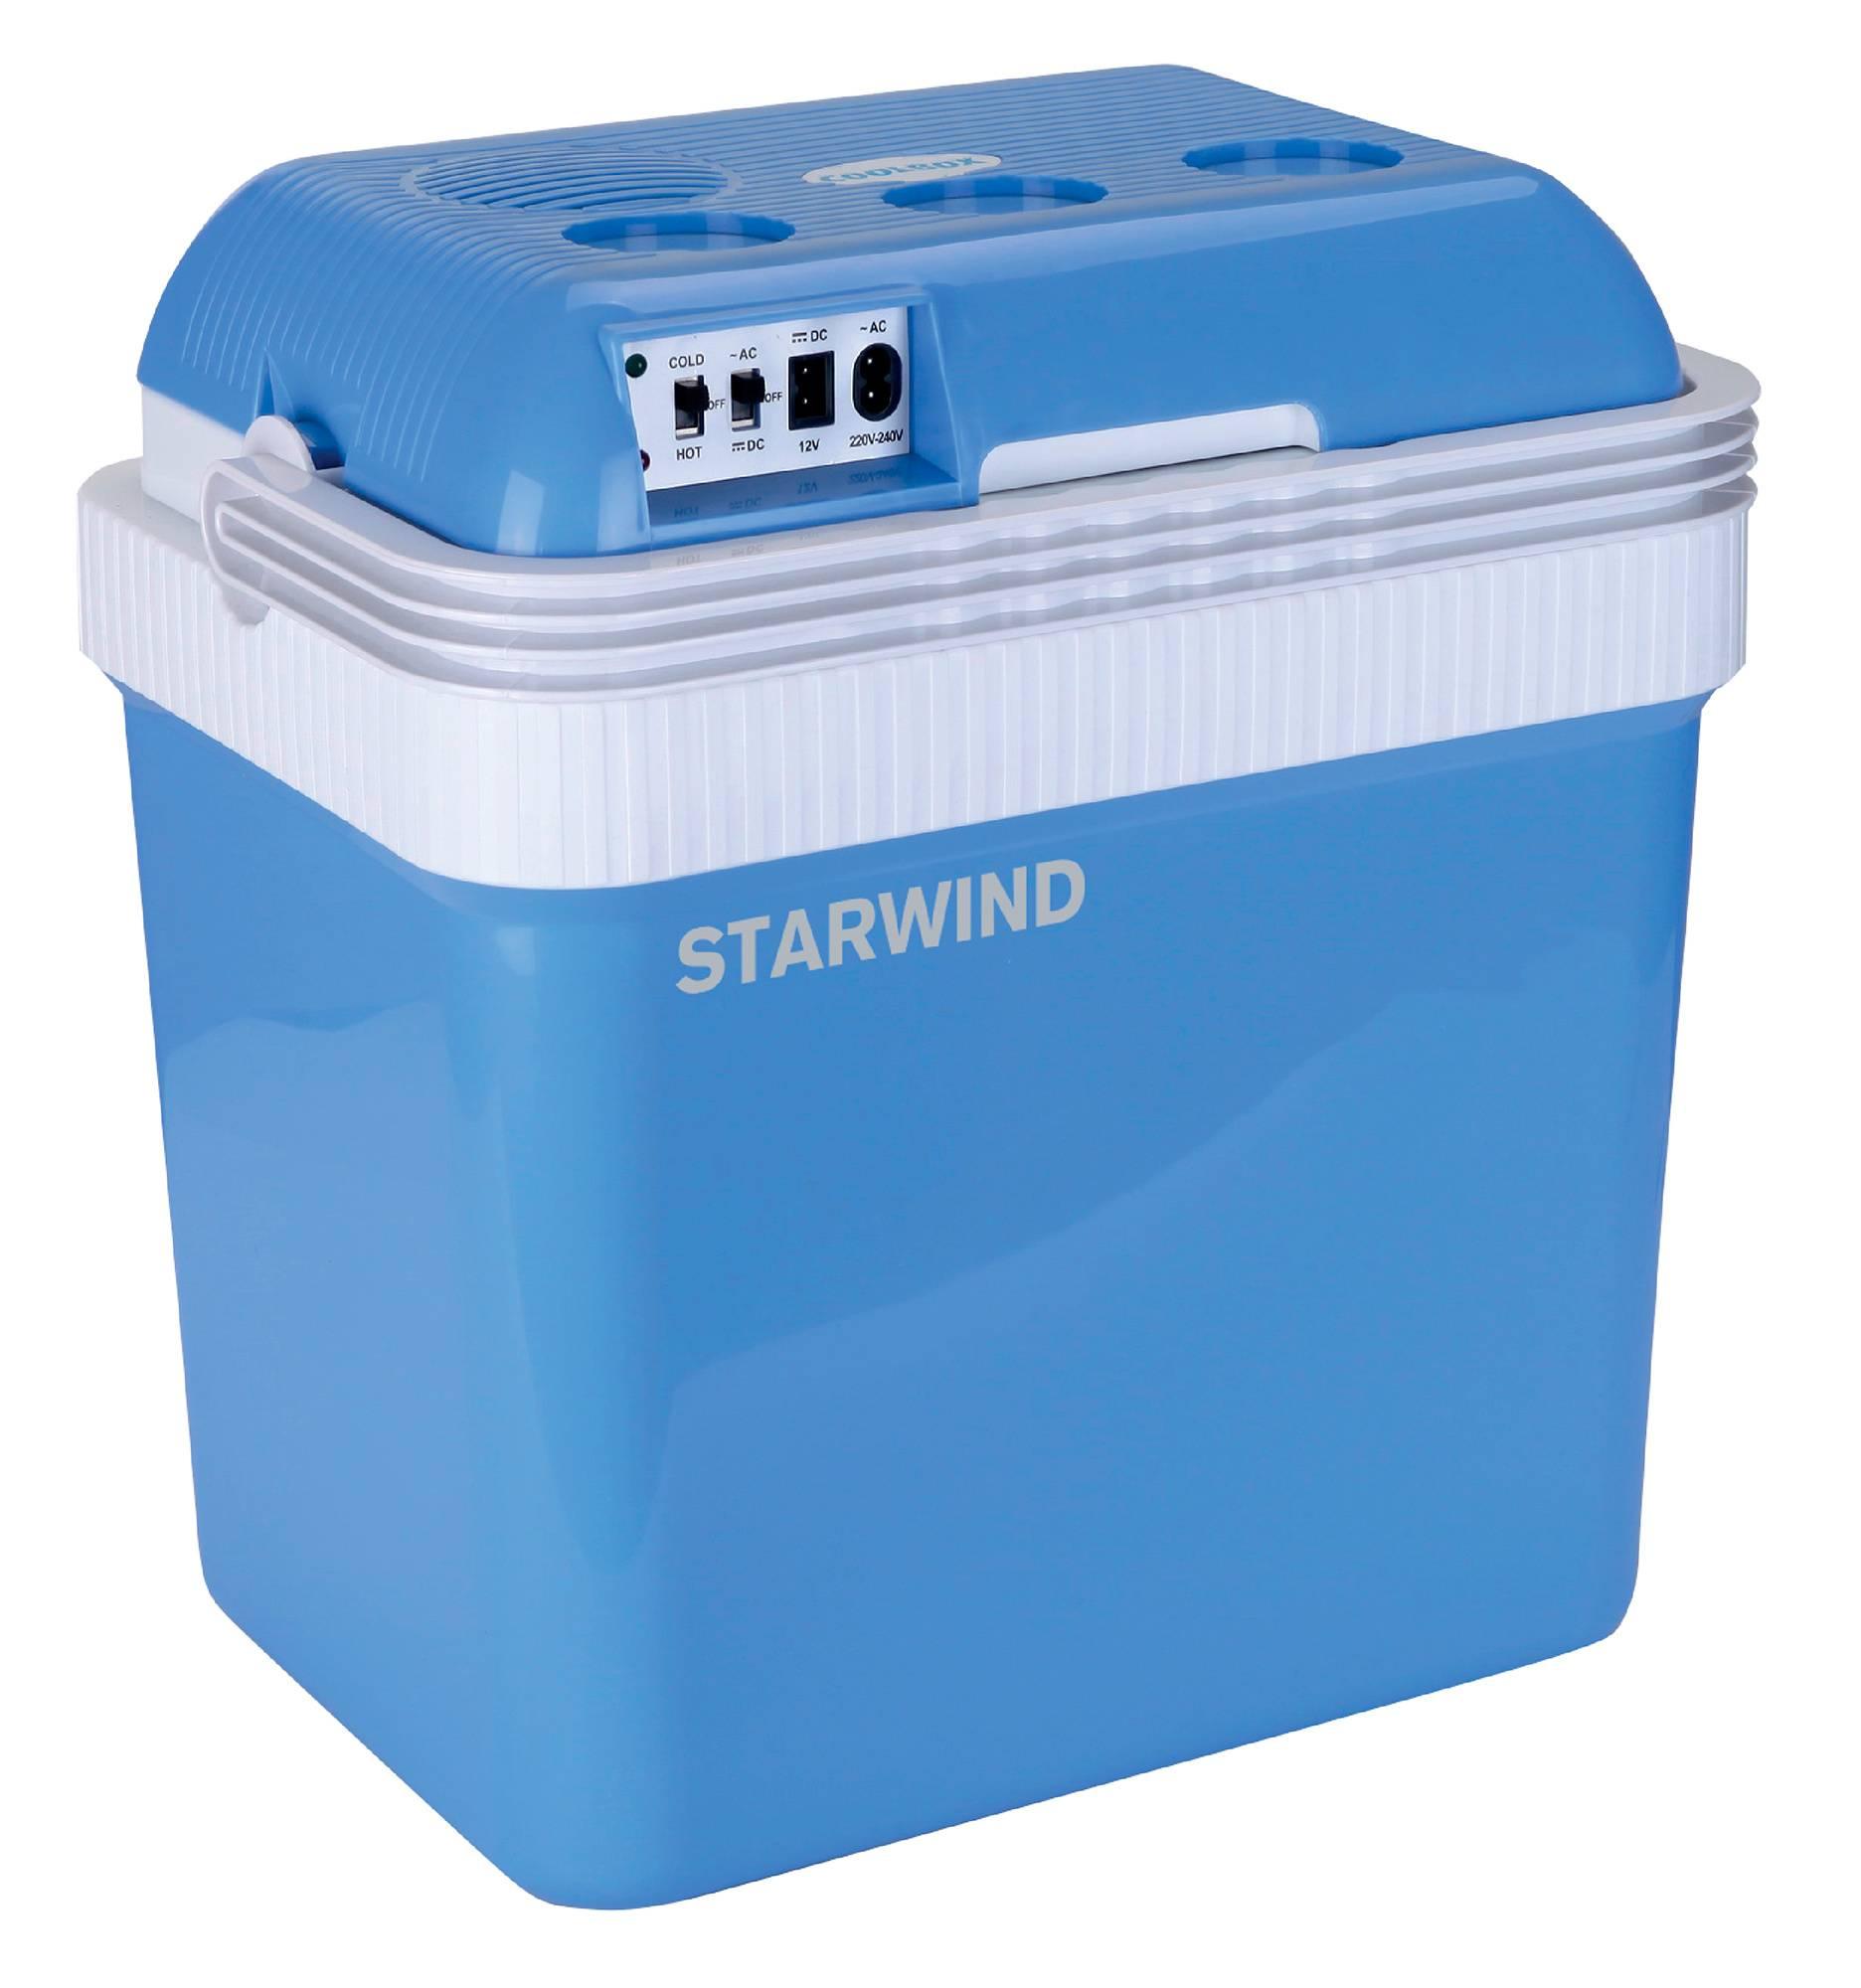 Автохолодильник Starwind CB-112 голубой - фото 1